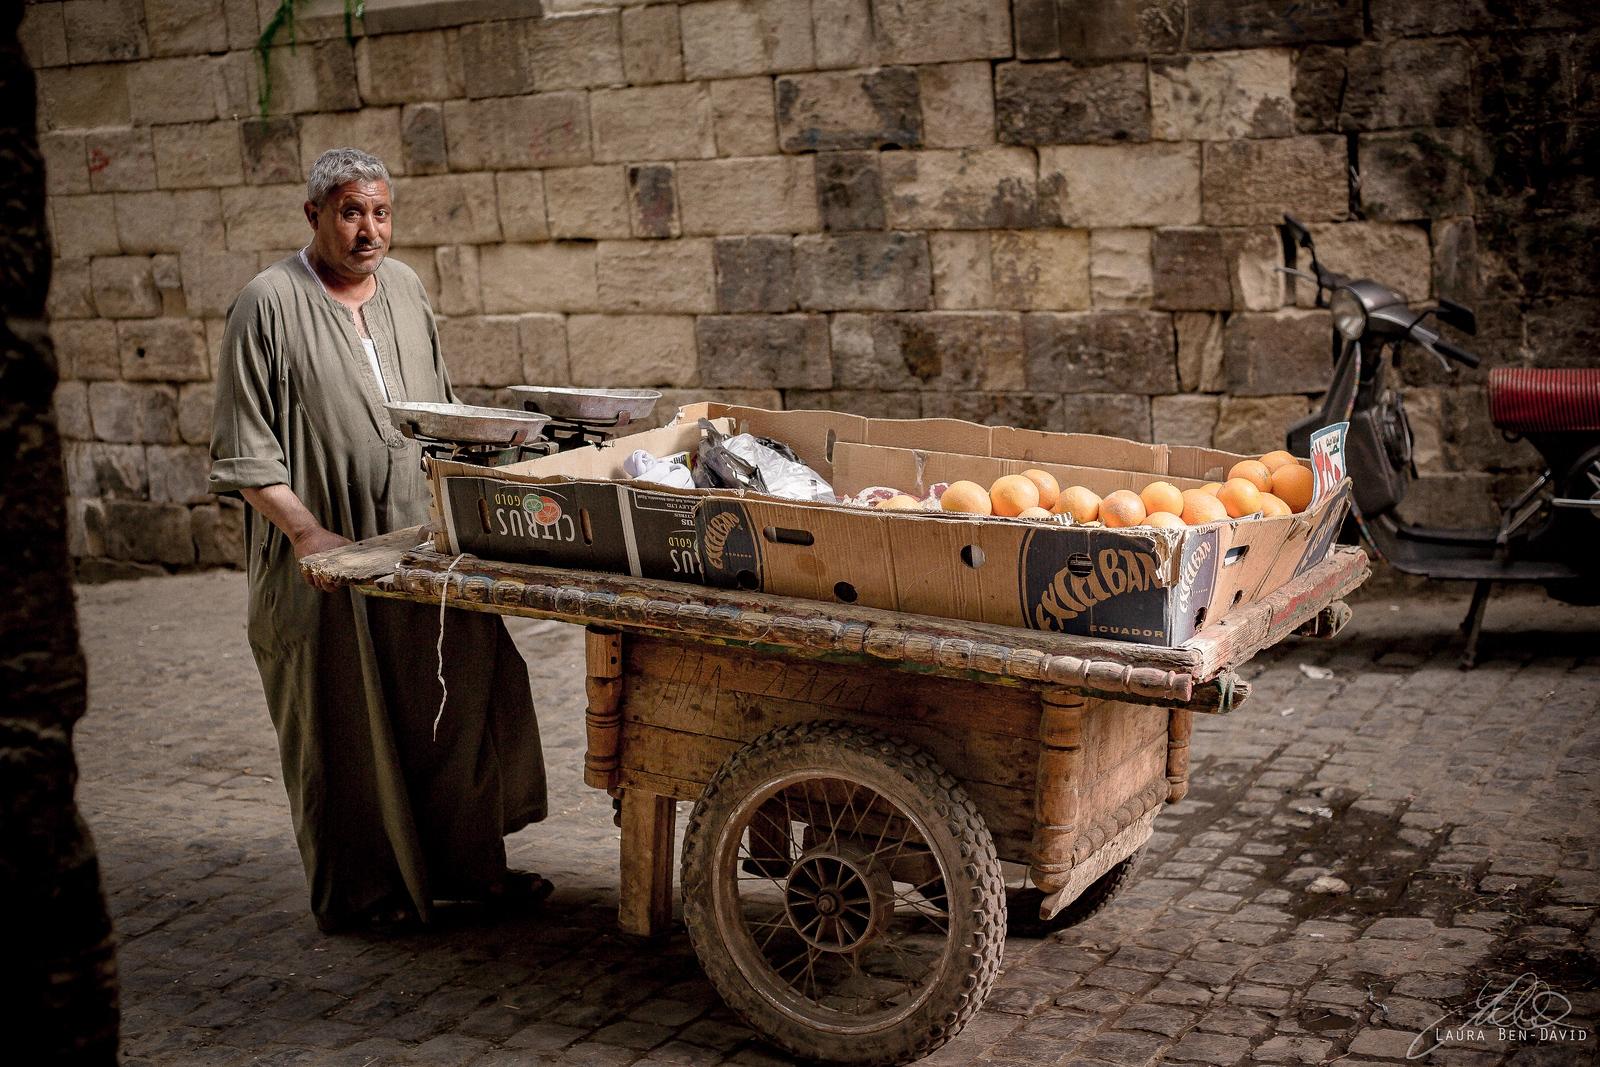 Street vendor in the old Jewish quarter in Cairo